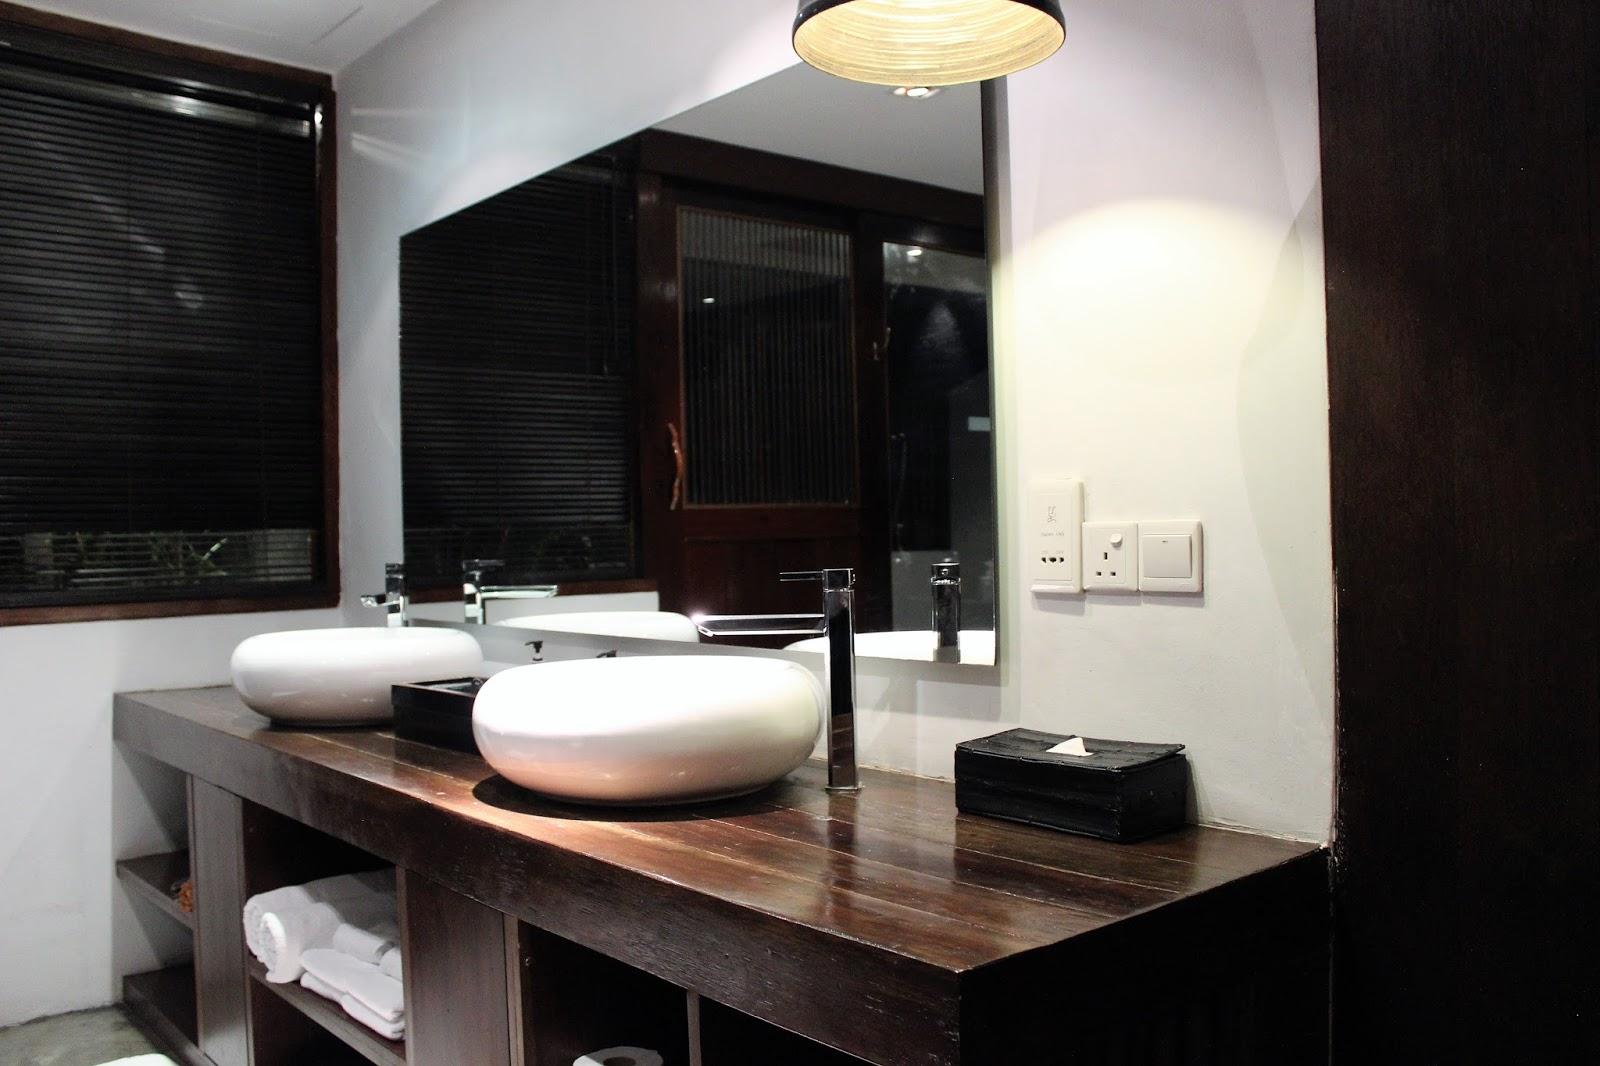 Travel on a Cloud: Villa Samadhi – romantiskt hotell i Kuala Lumpur : bubbelbadkar hörn : Badkar